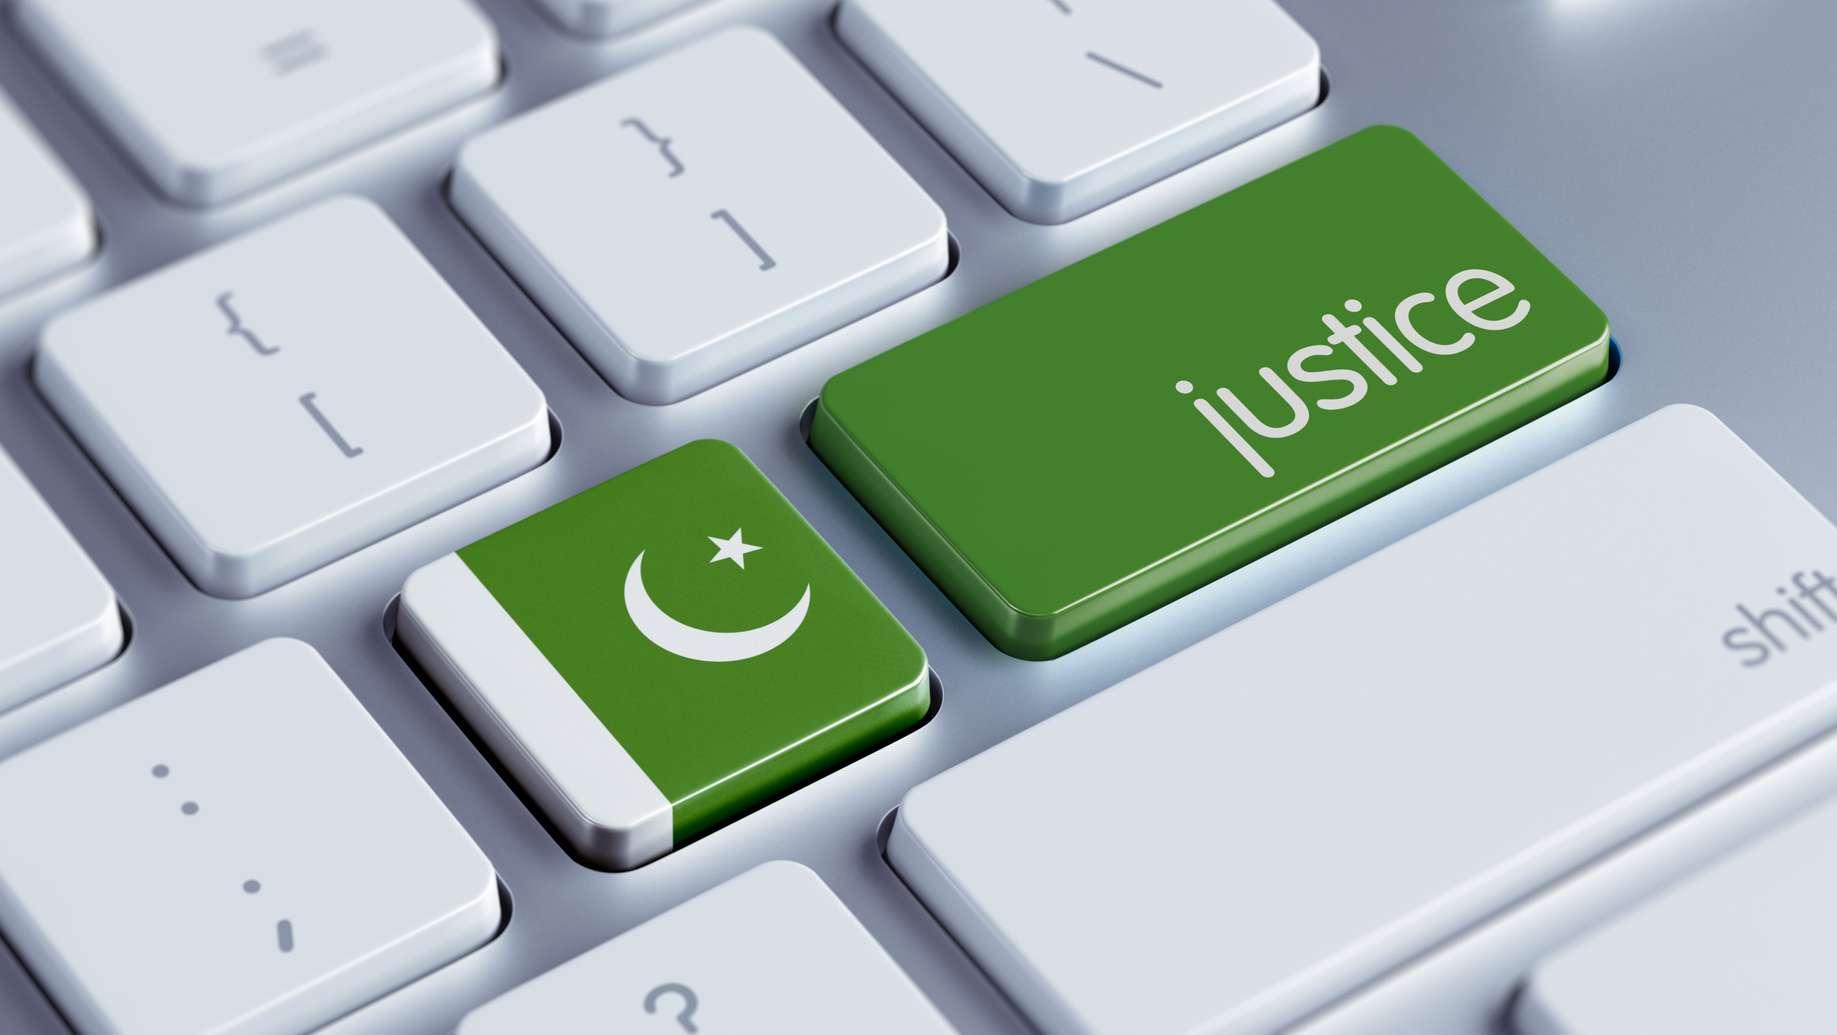 Pakistan Justice Concept